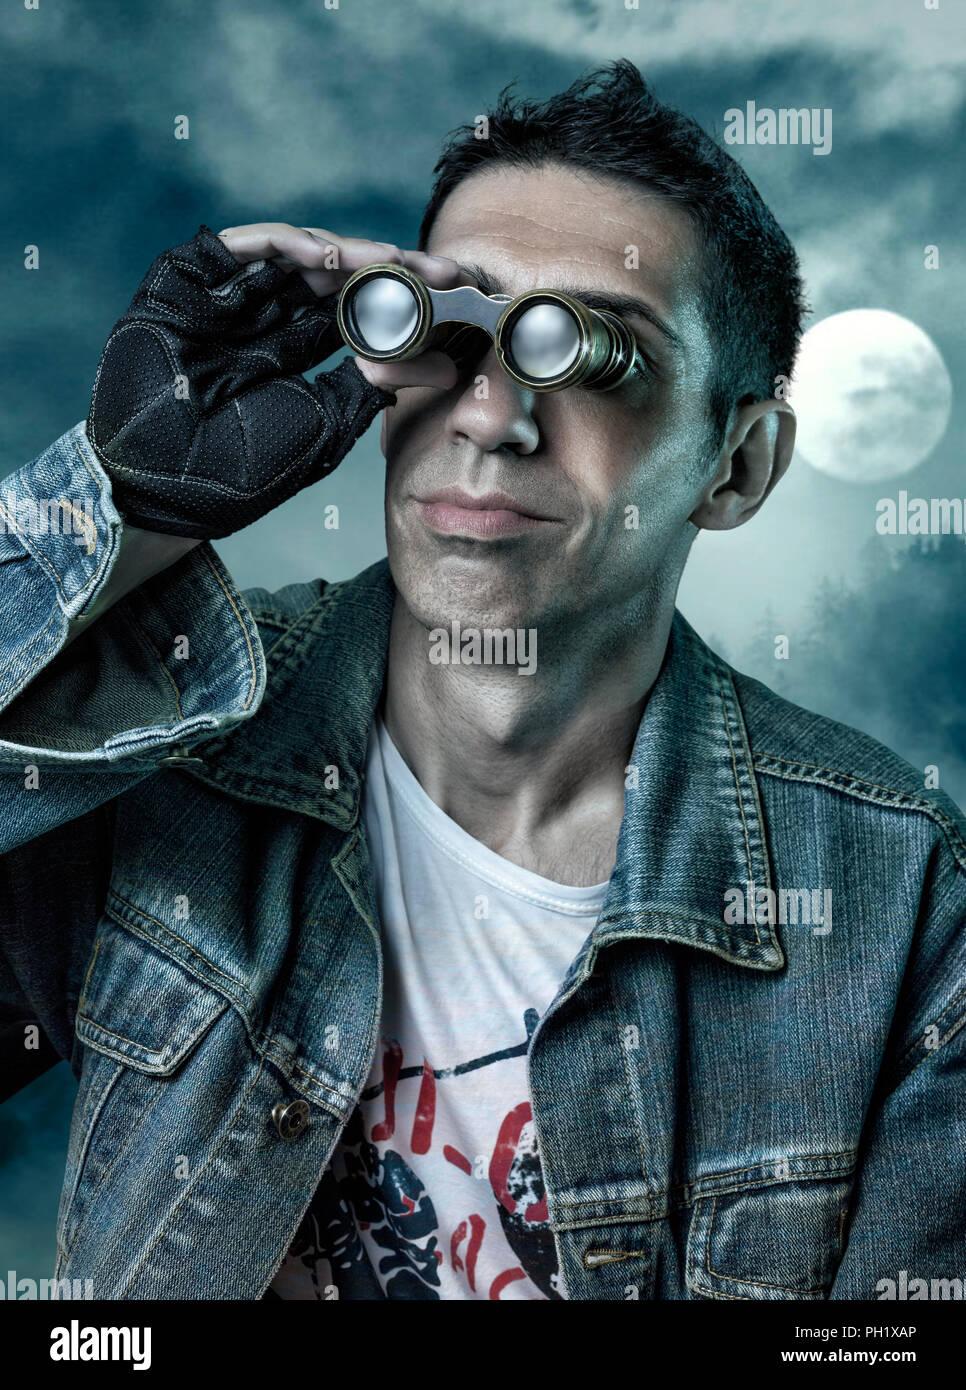 Man looking far away with his old binoculars at night. - Stock Image